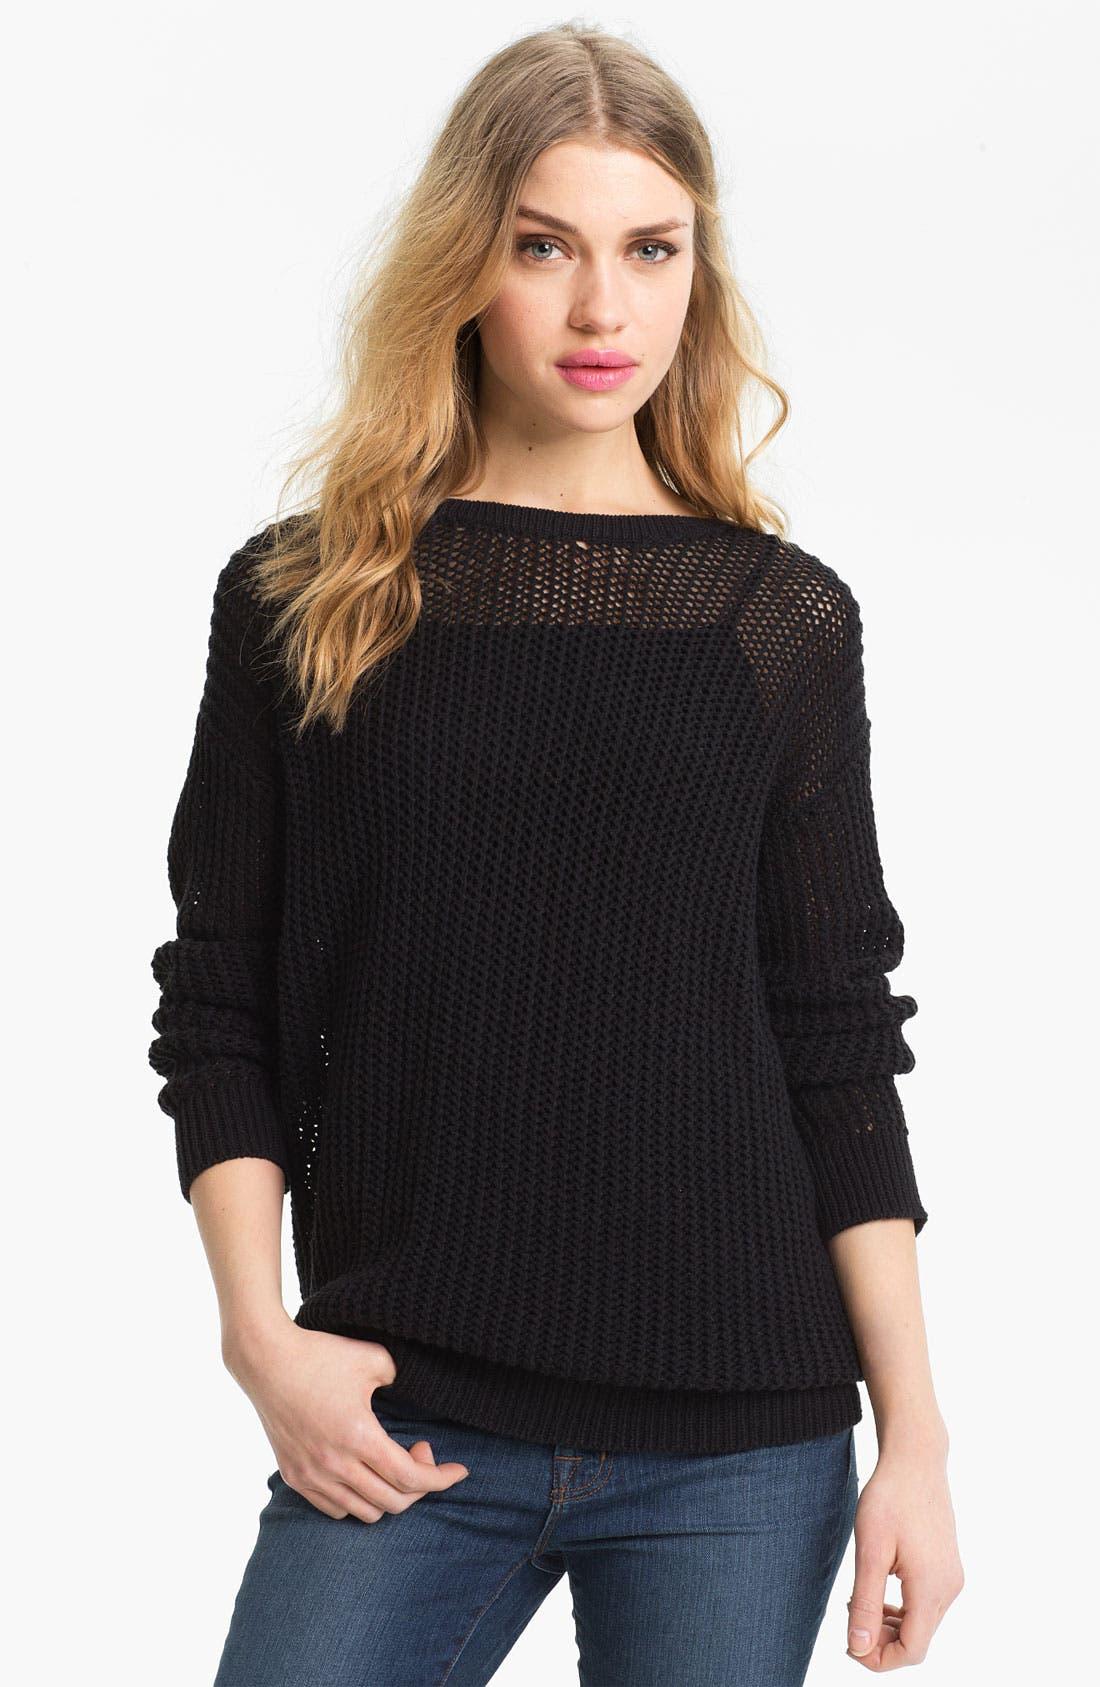 Alternate Image 1 Selected - Trouvé Sheer Lattice Cutout Sweater